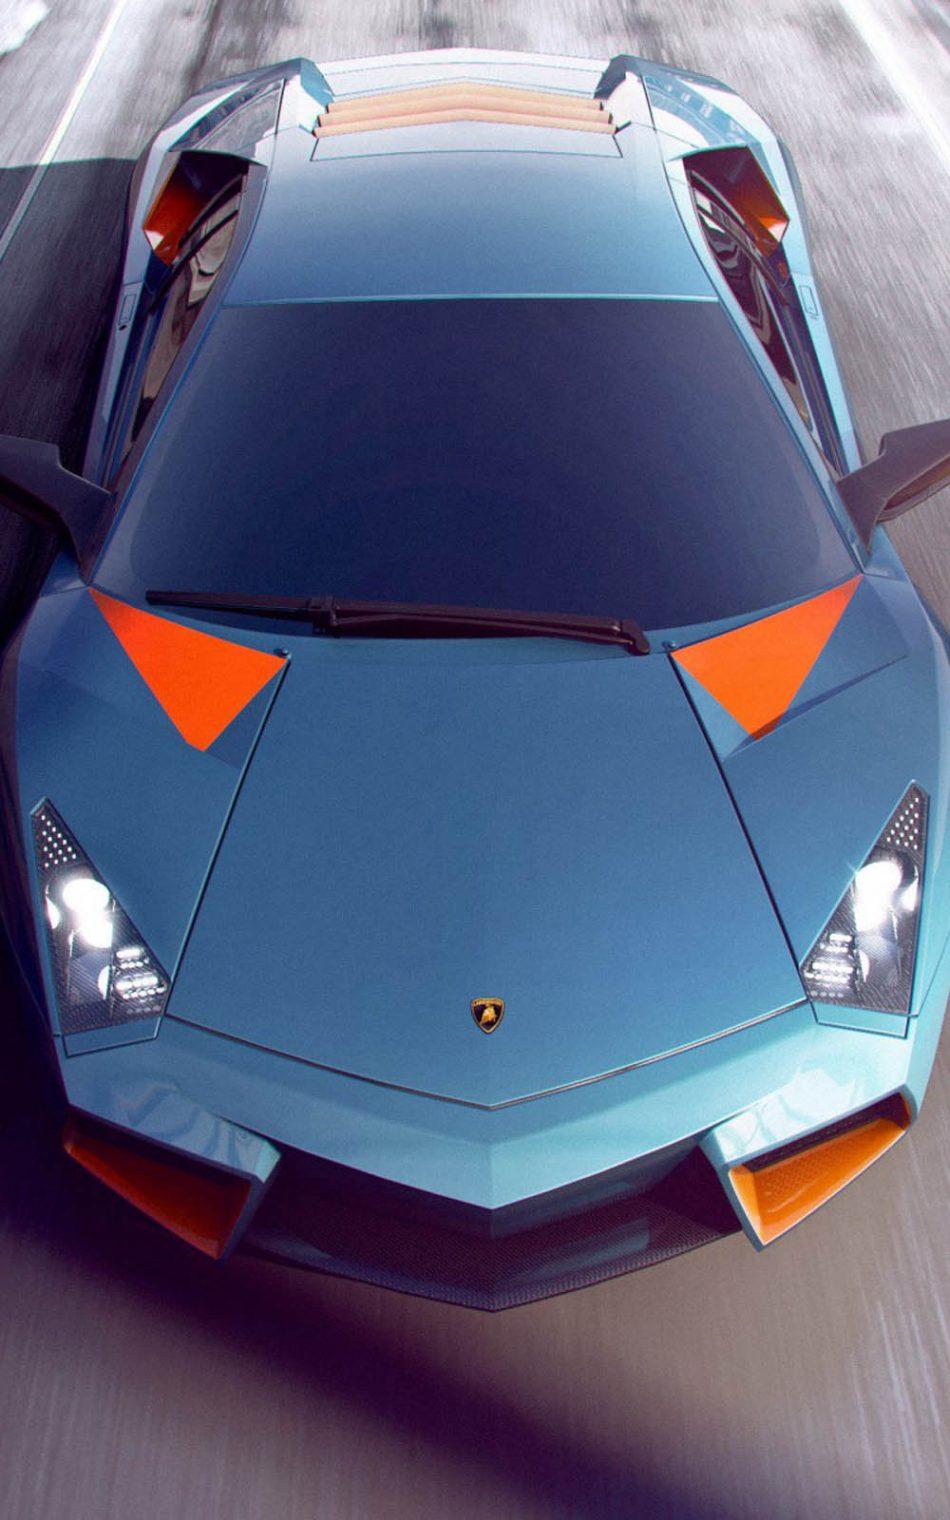 Download Lamborghini Cgi 2017 Free Pure 4k Ultra Hd Mobile Wallpaper